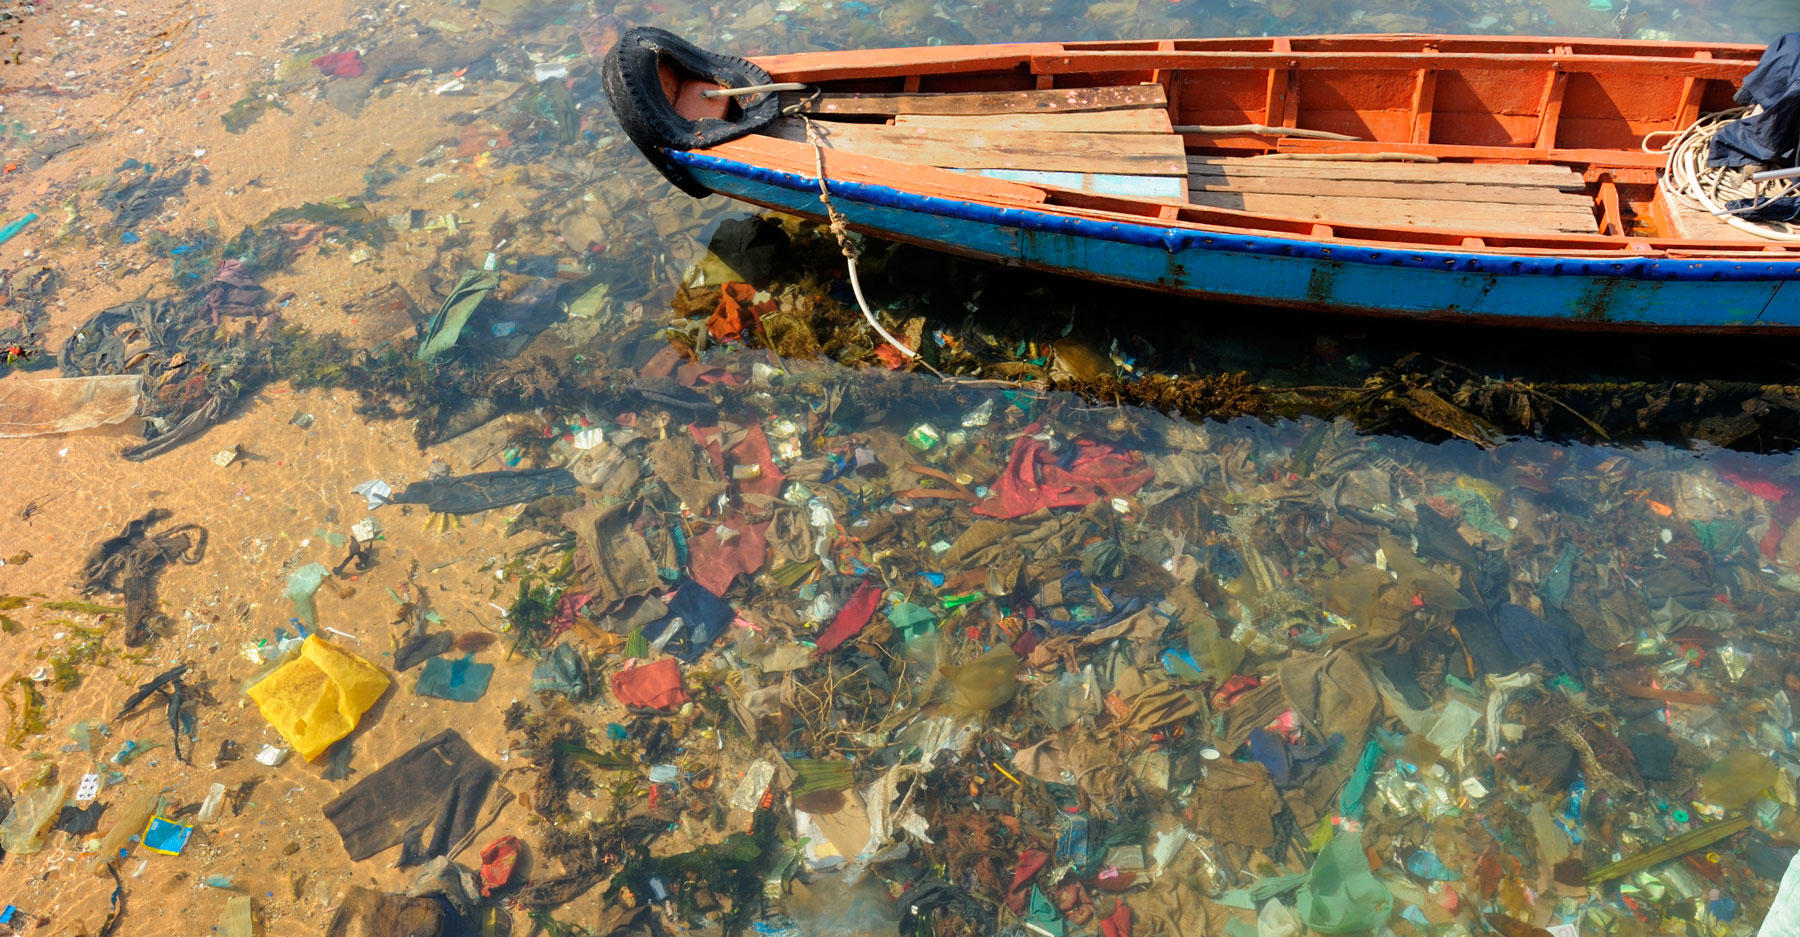 Garbage Sea